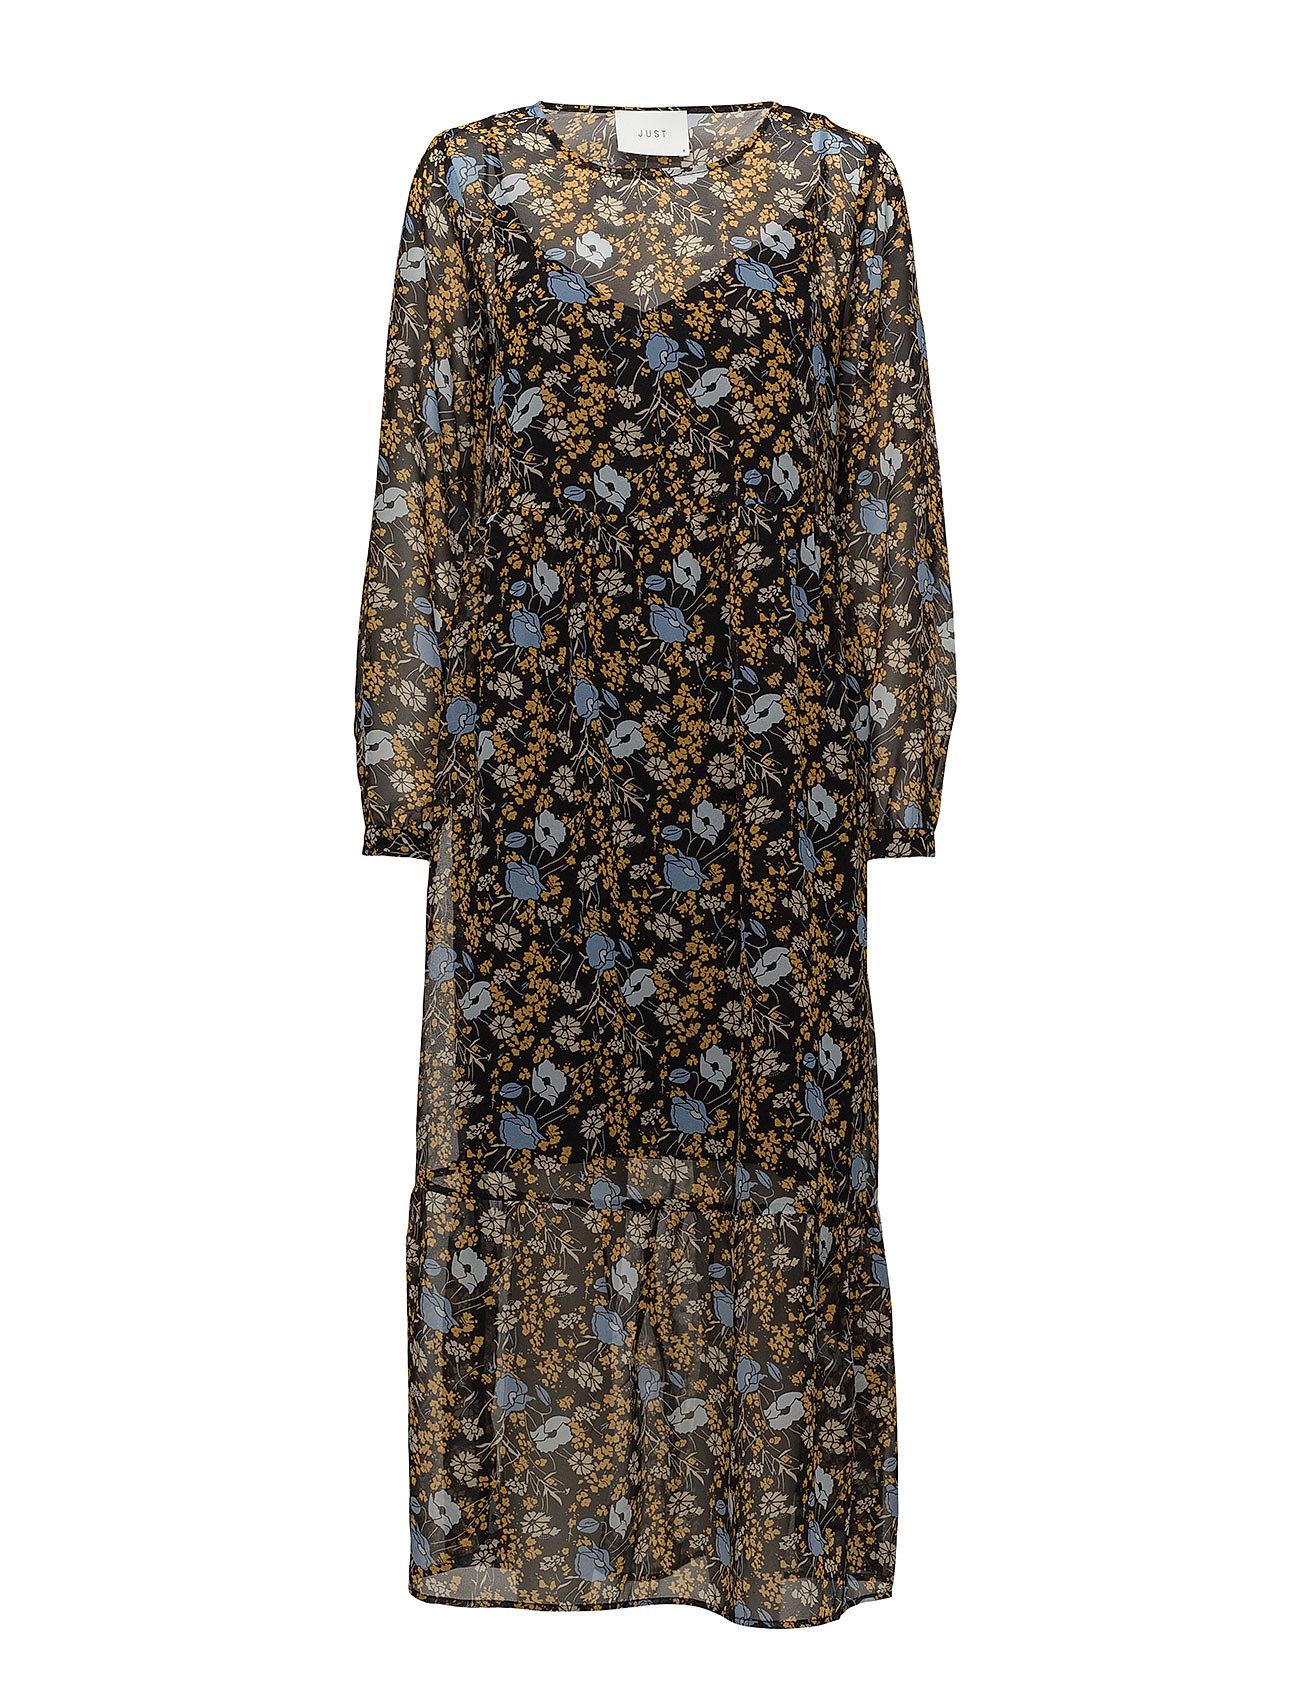 Image of Antonin Maxi Dress Knælang Kjole Gul JUST FEMALE (3052621075)